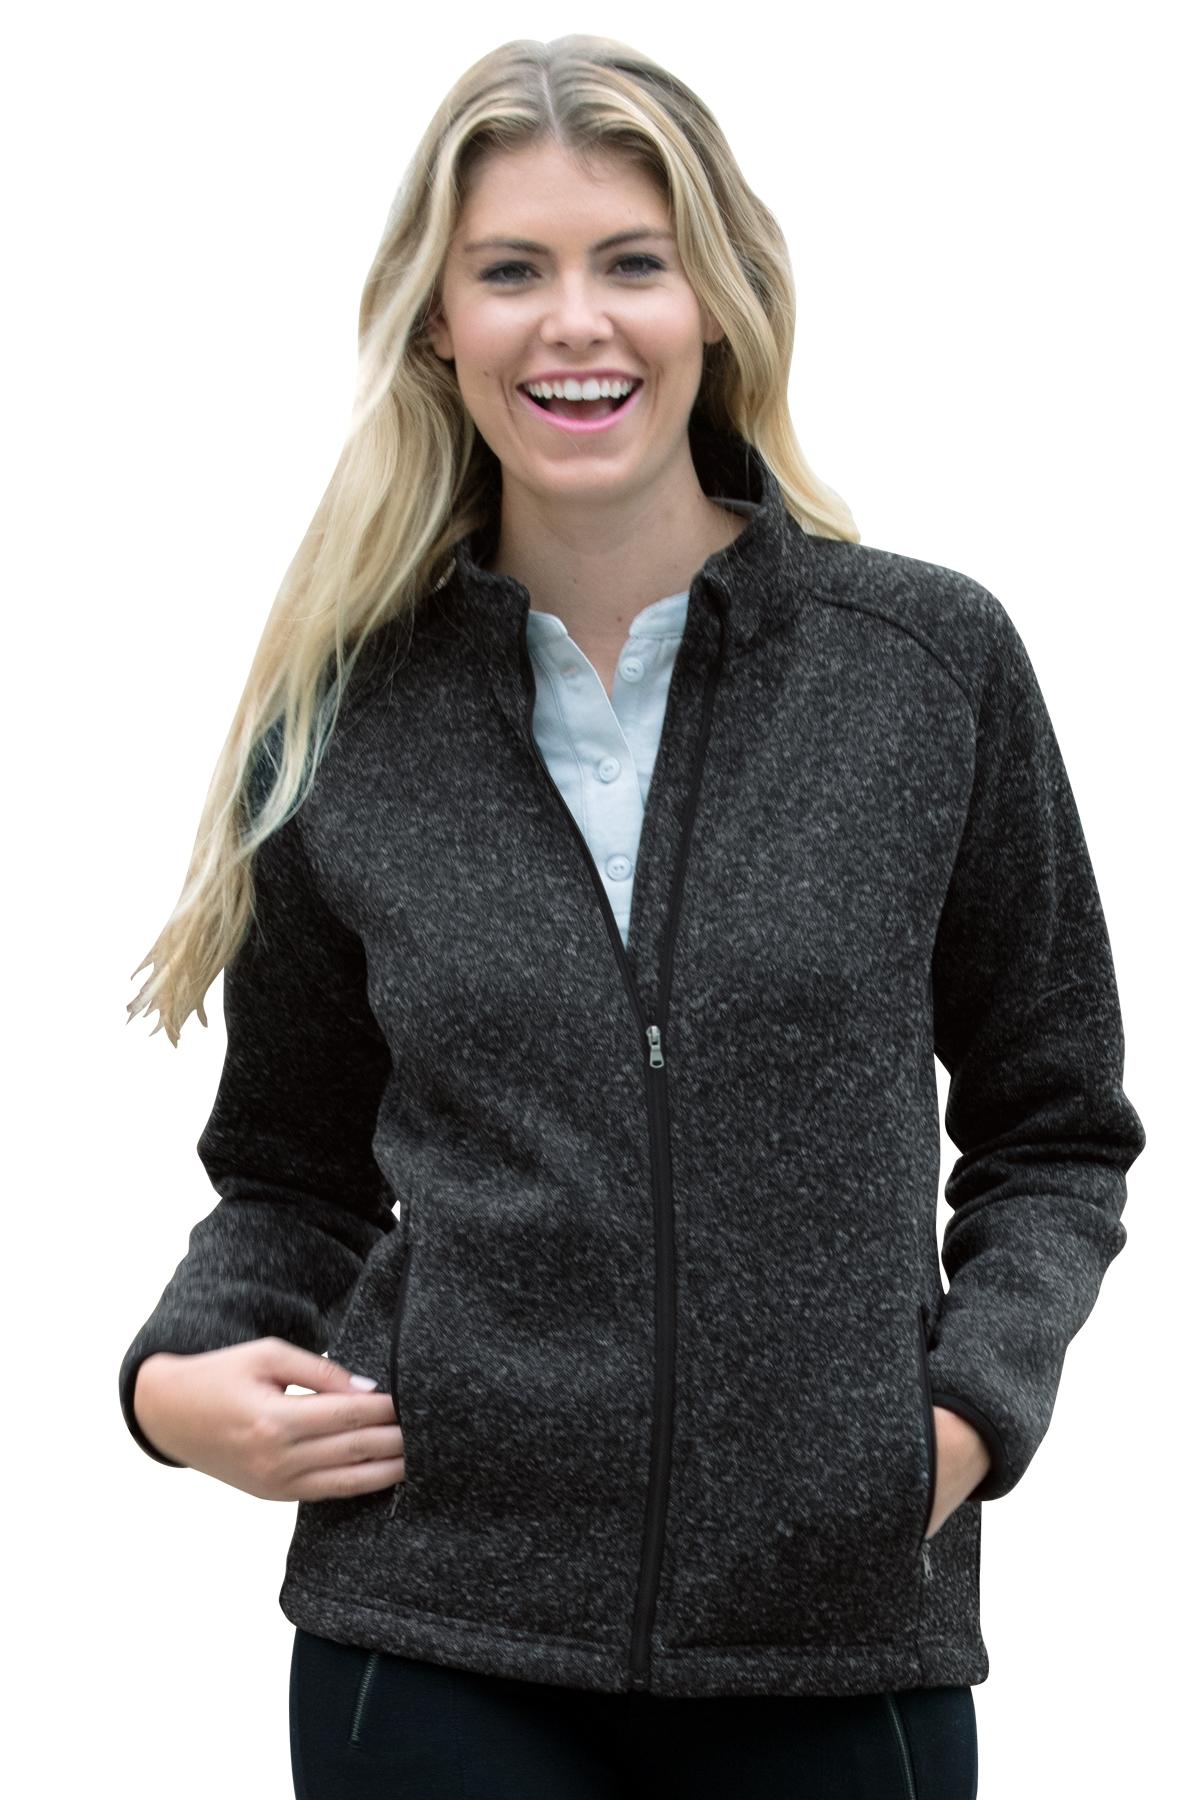 Vantage 3306 - Women's Summit Sweater-Fleece Jacket